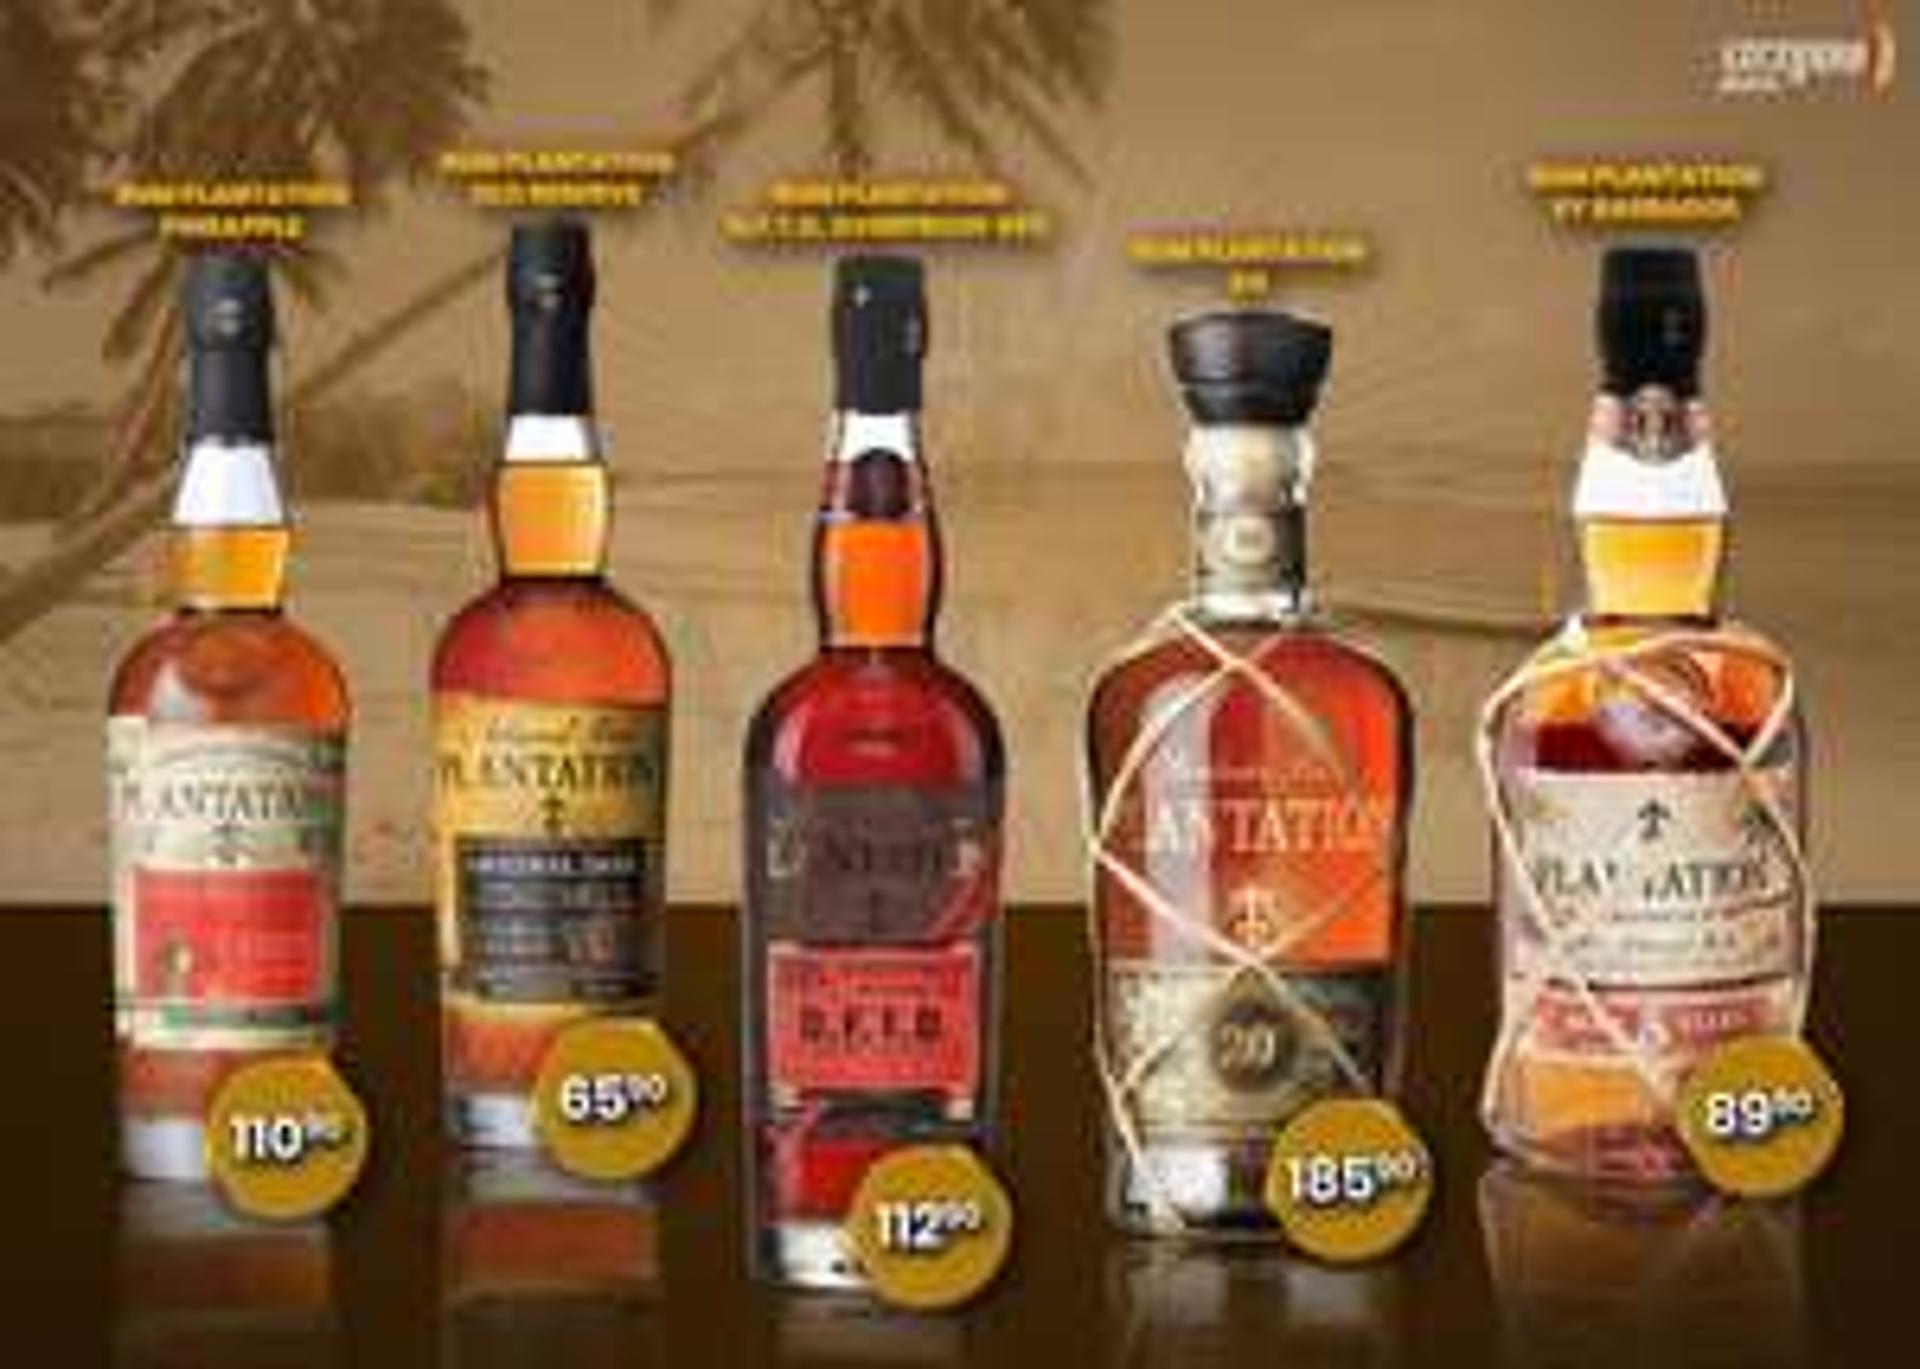 Rum Plantation 20 - Szczyrba Alkohole